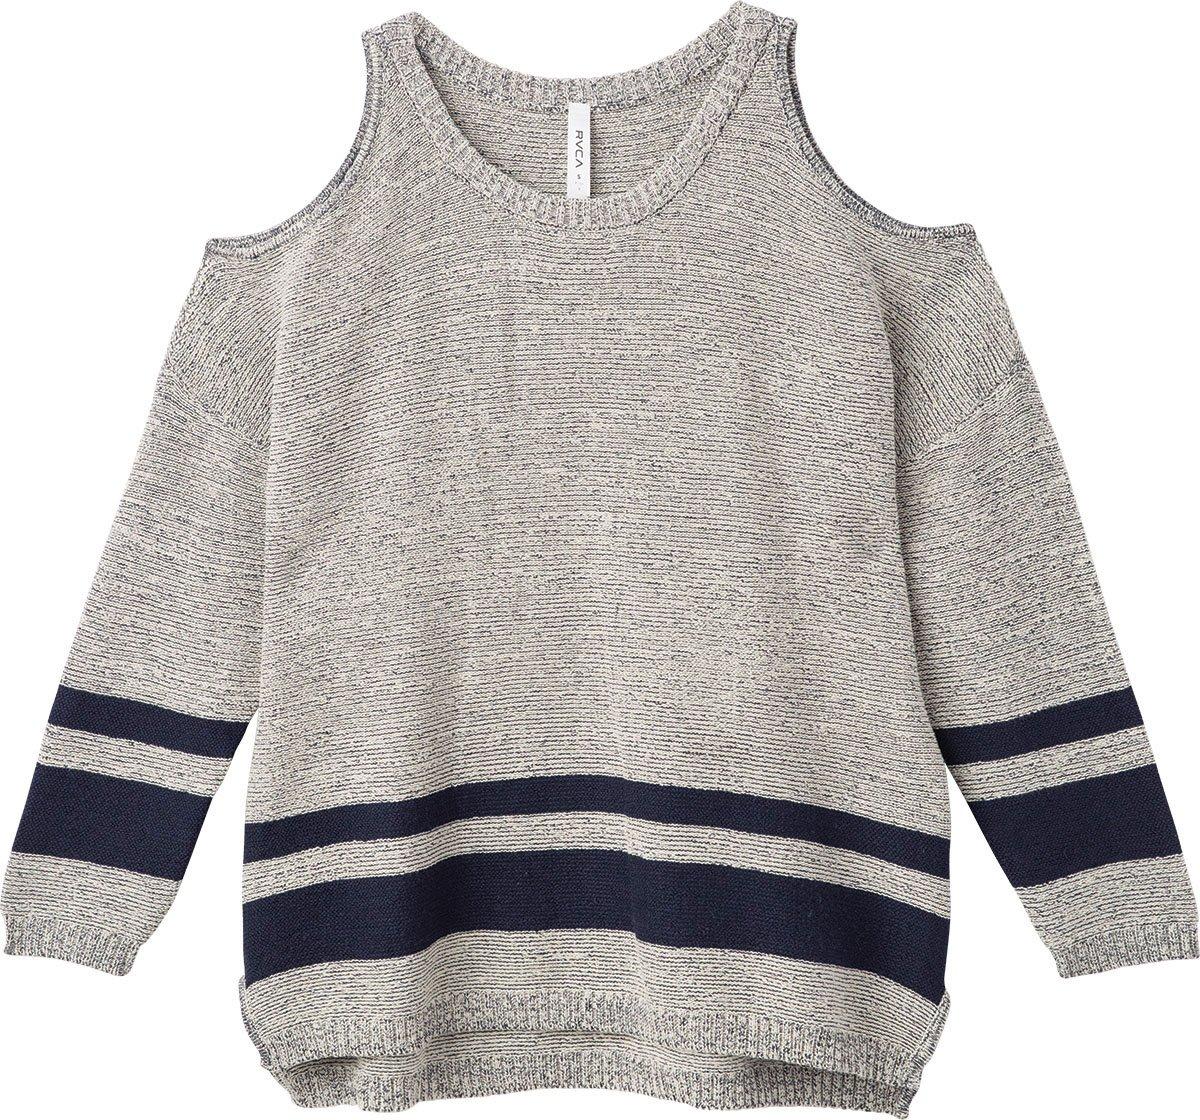 RVCA Women's Marked Sweater, Heather Grey, M